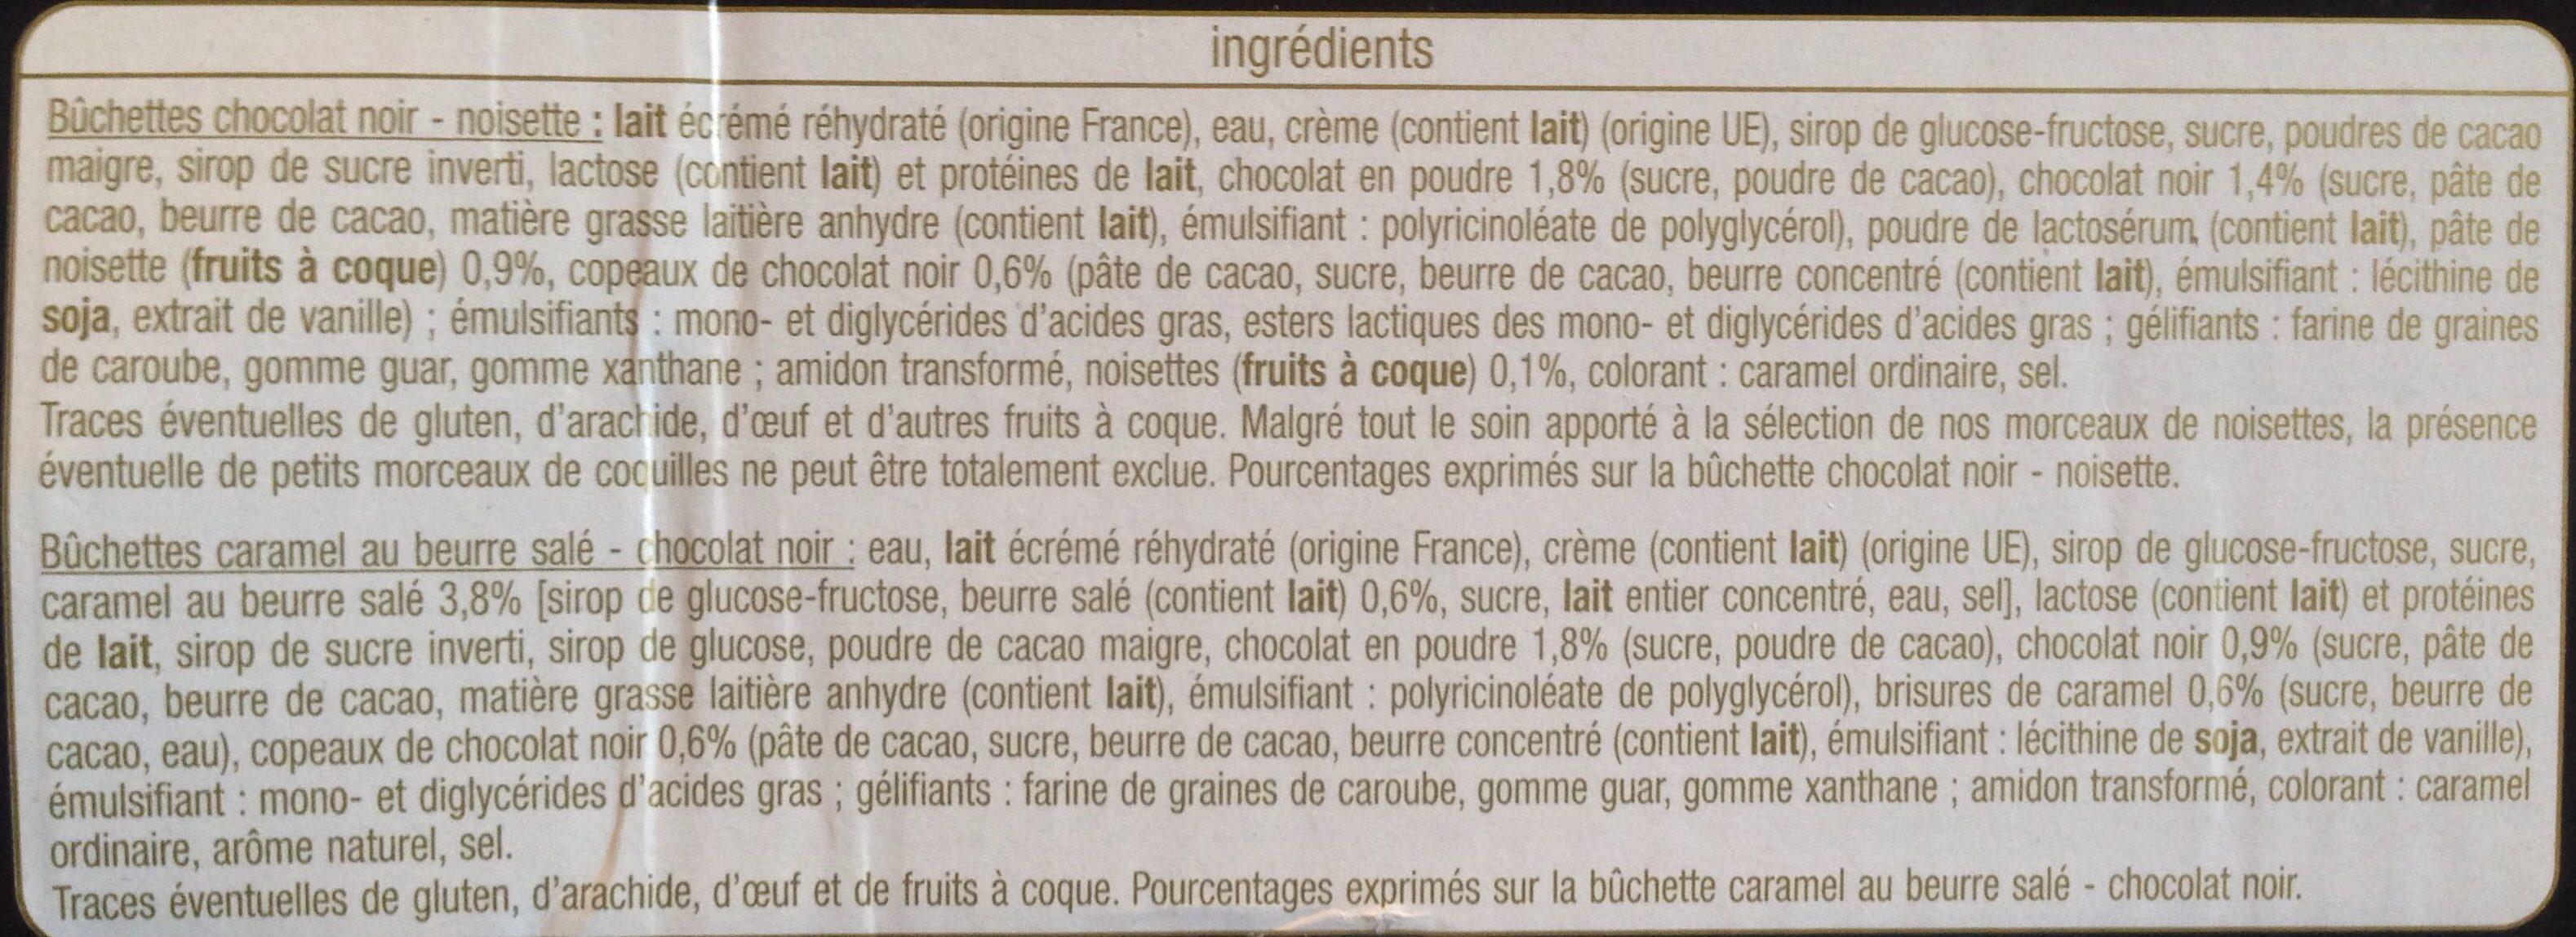 Bûchettes caramel et chocolat - Ingredients - fr